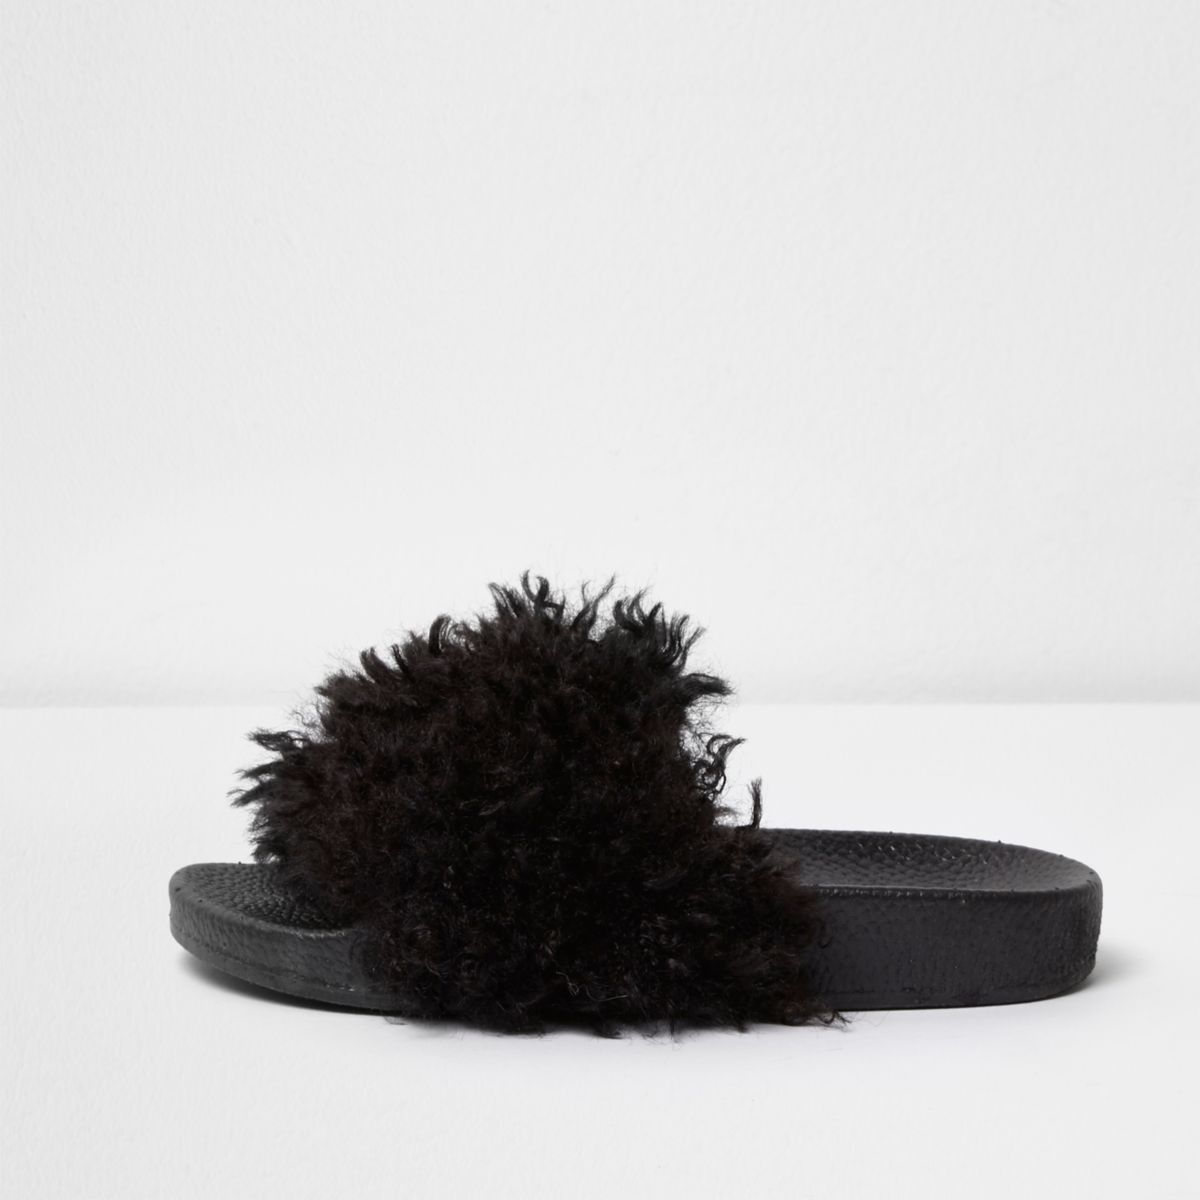 Schwarze Slipper aus Kunstfell